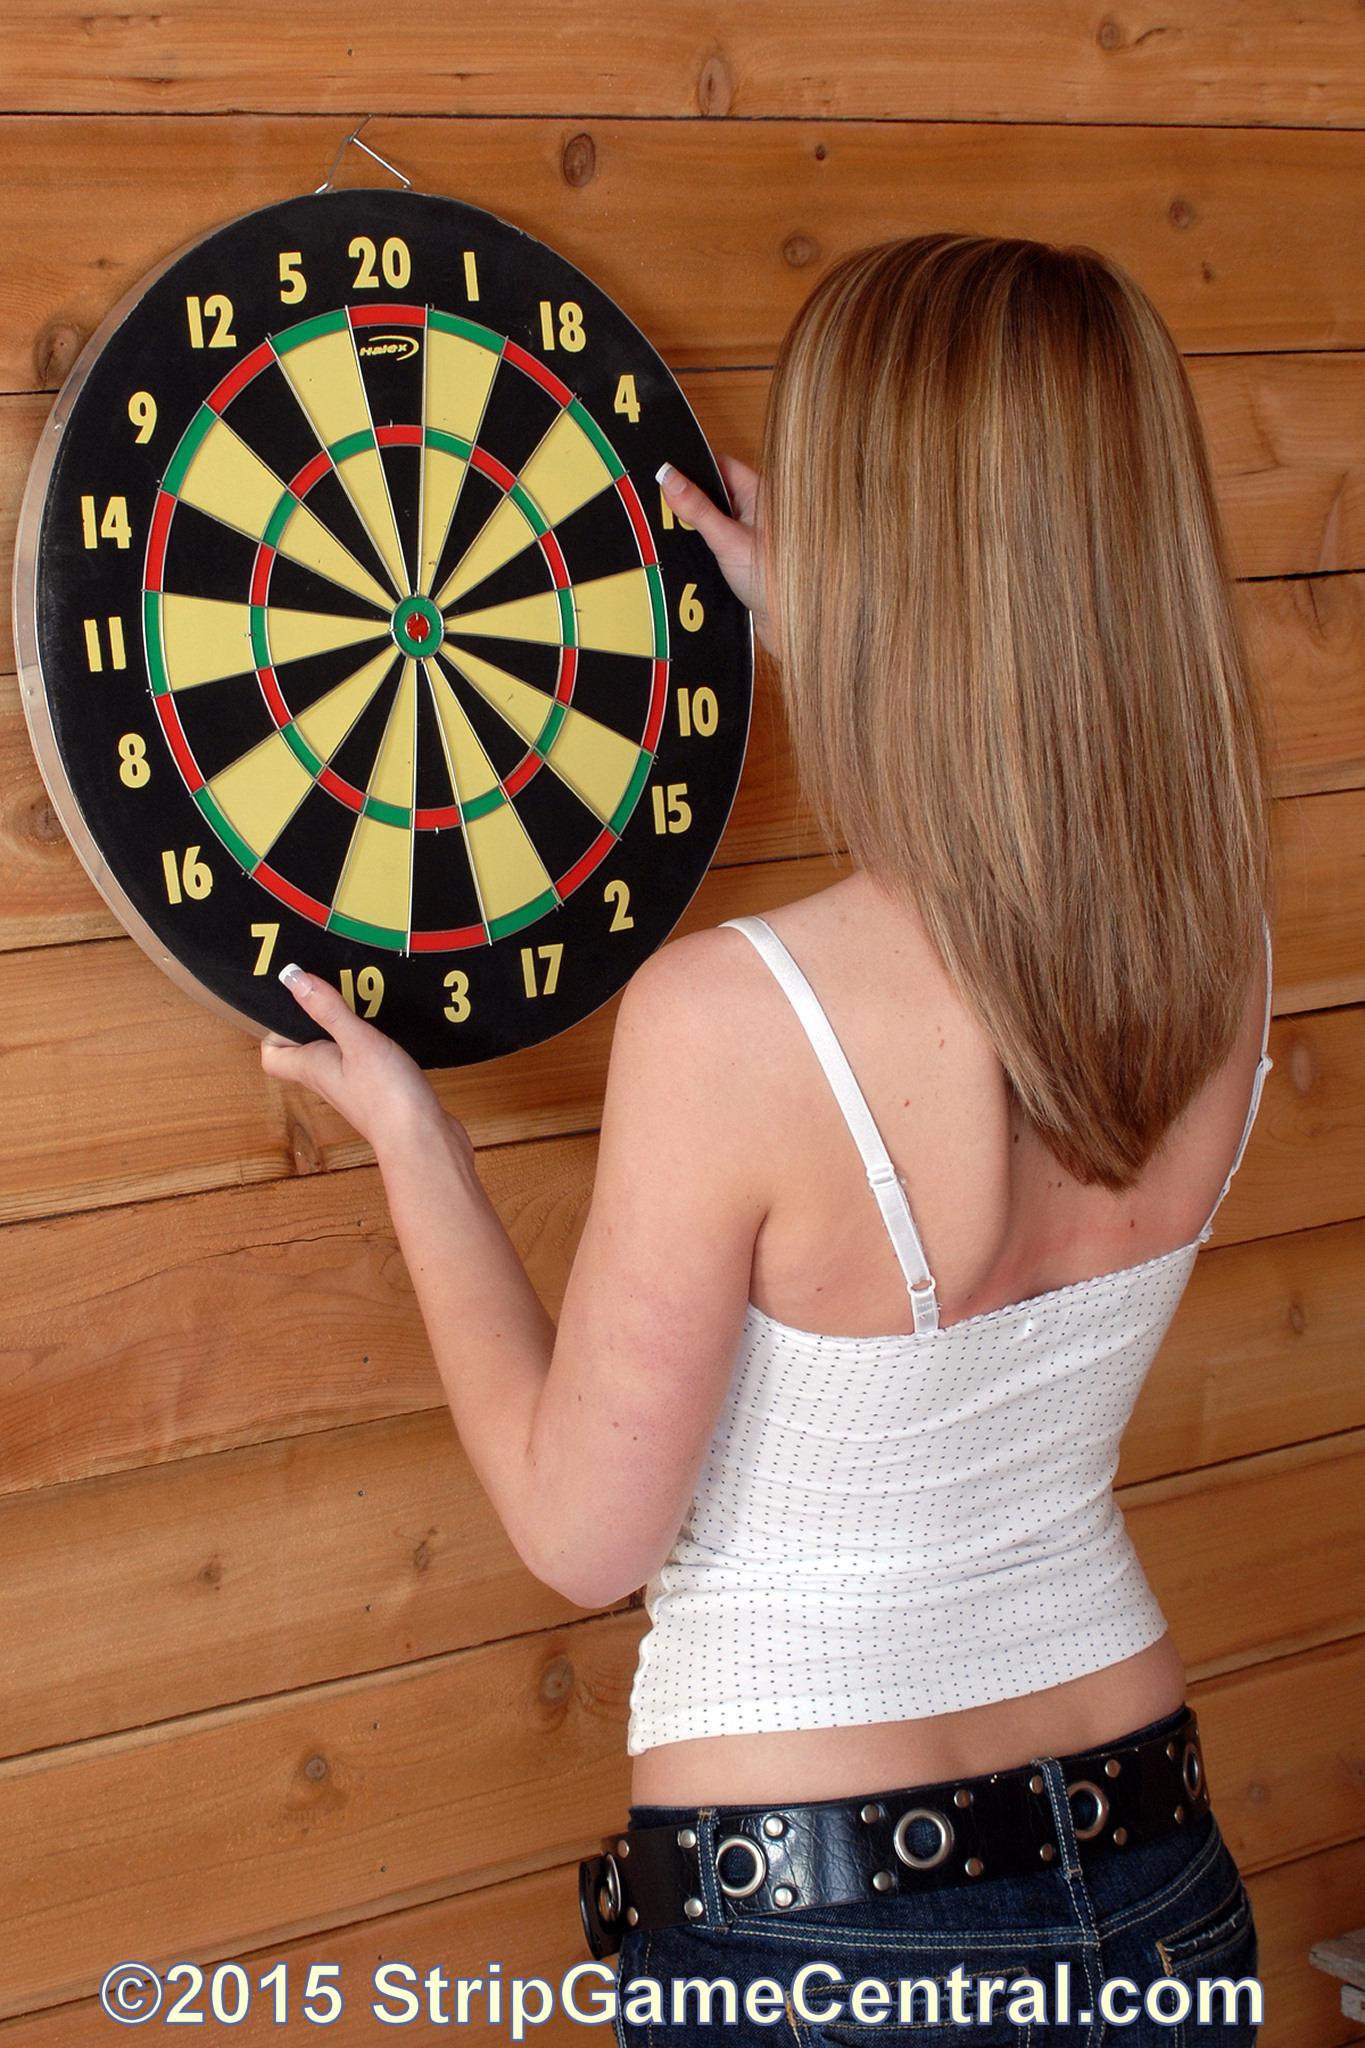 strip darts game